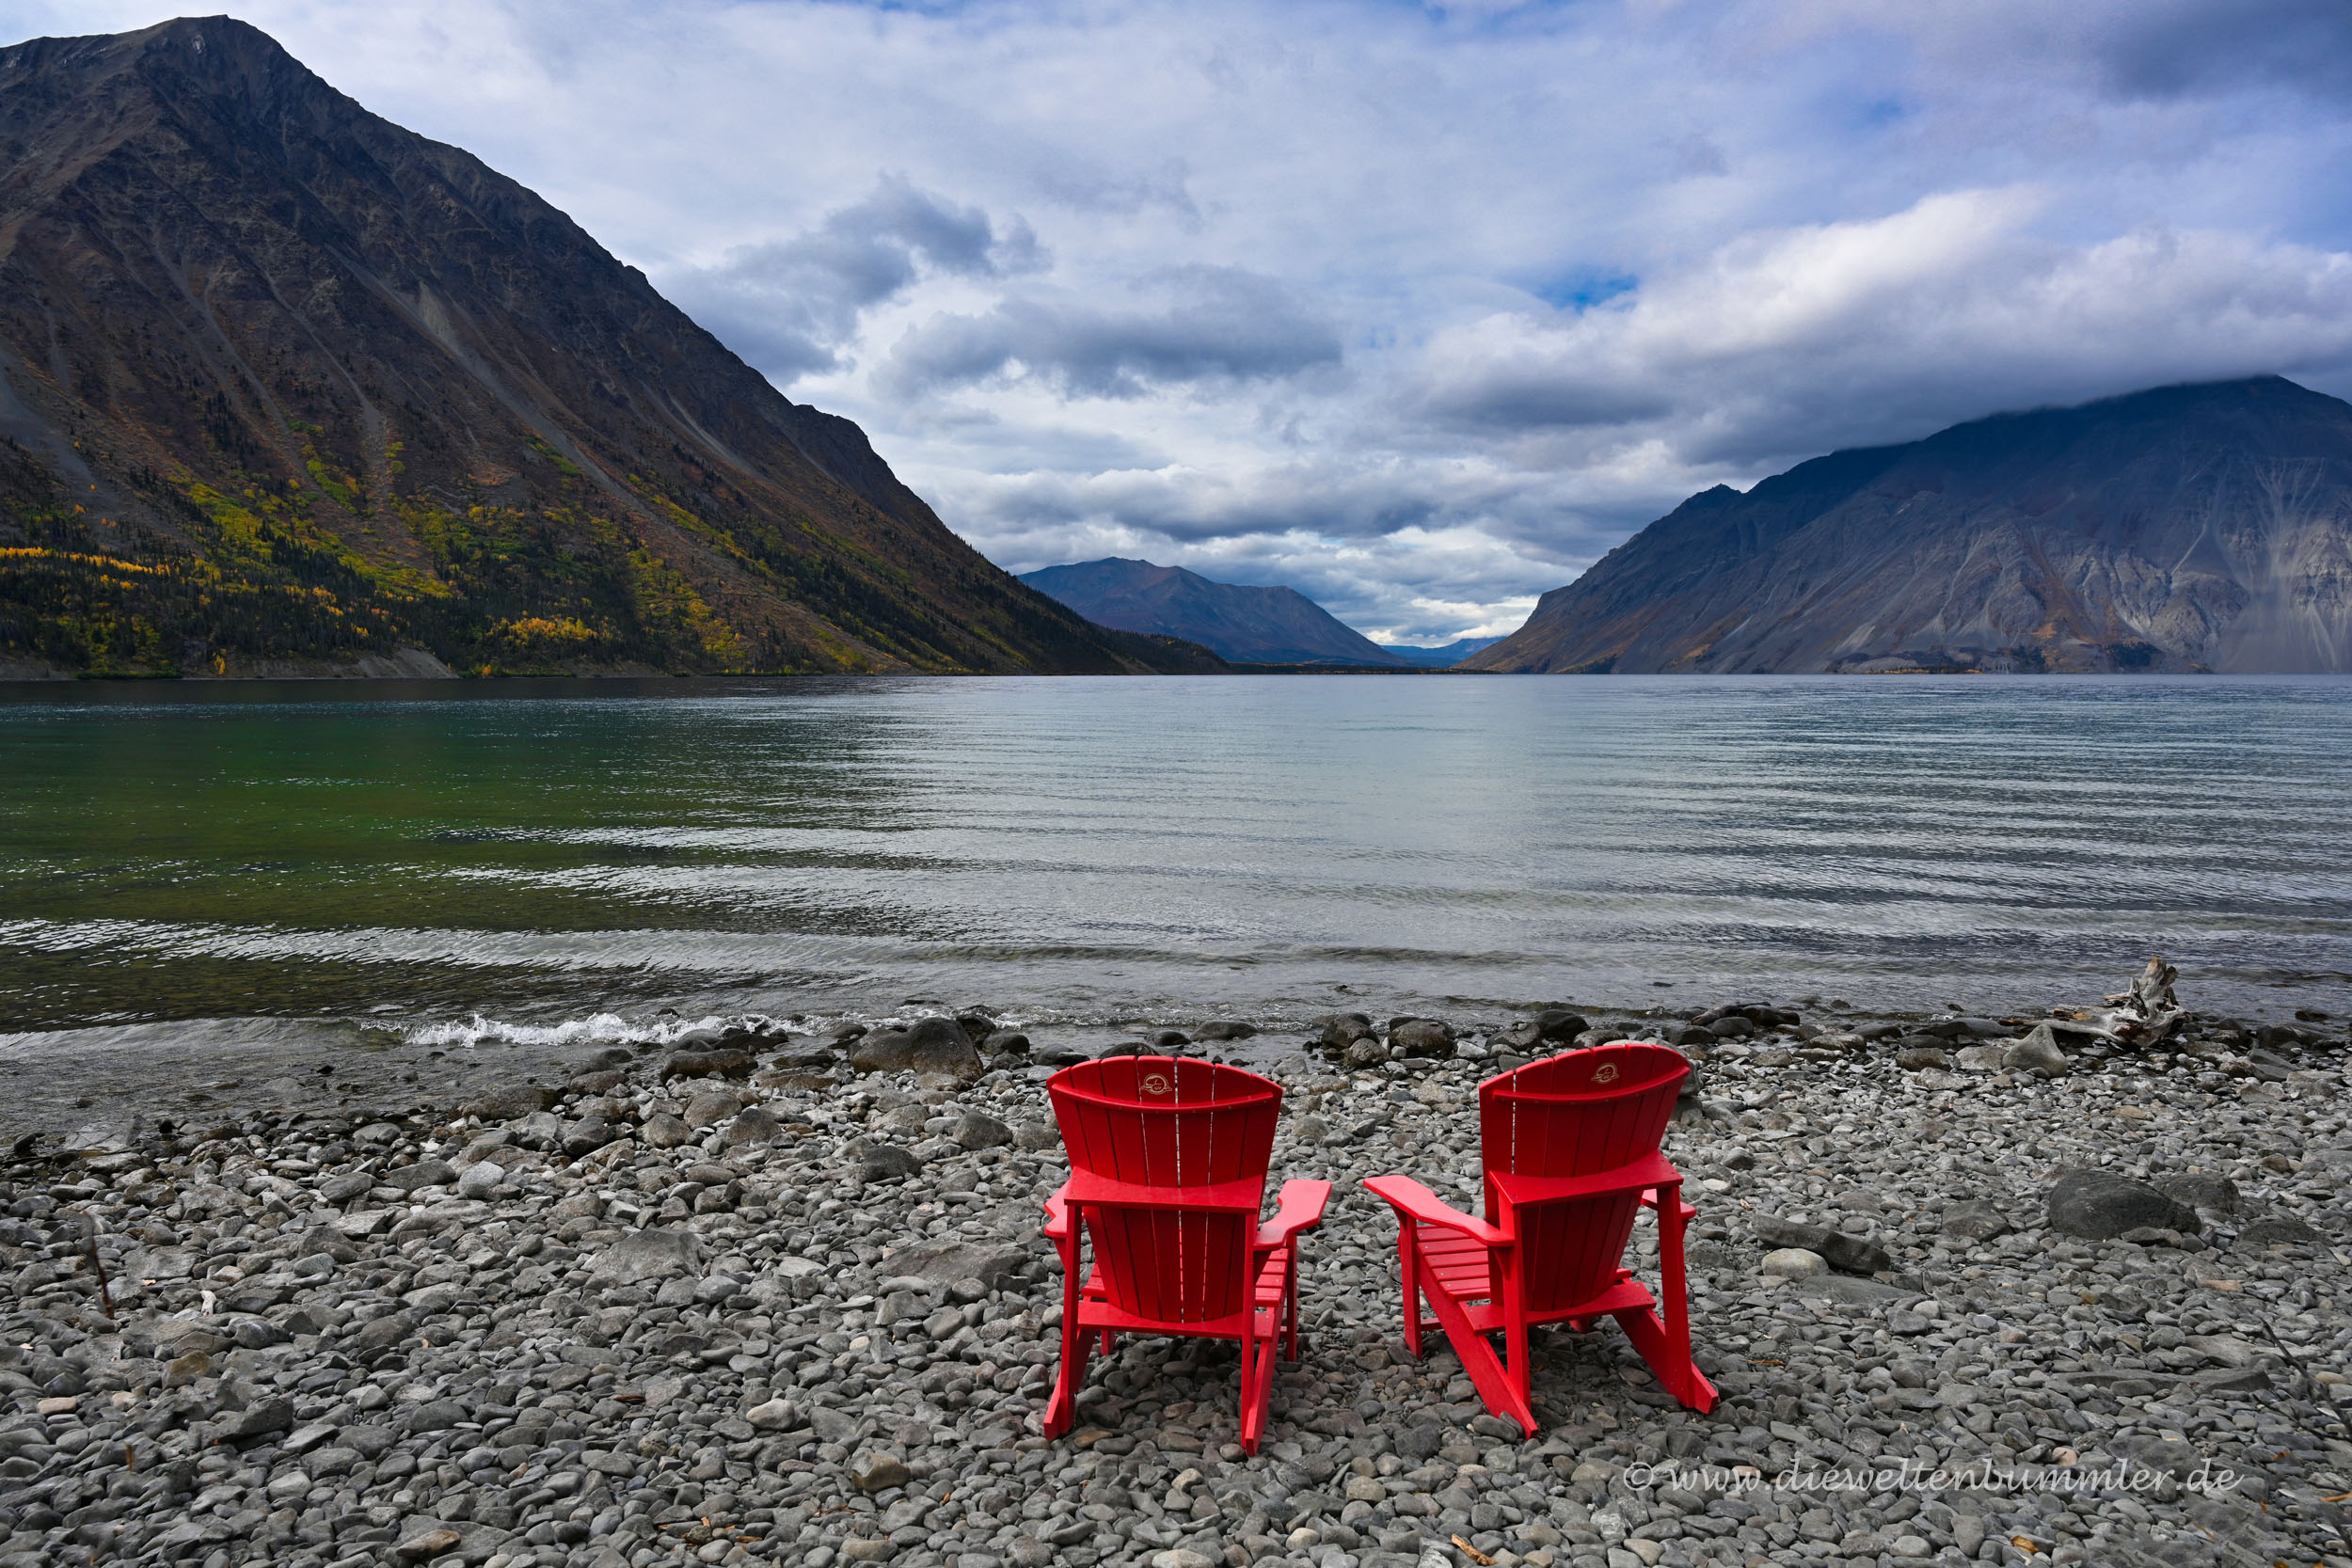 Rote Stühle am Strand